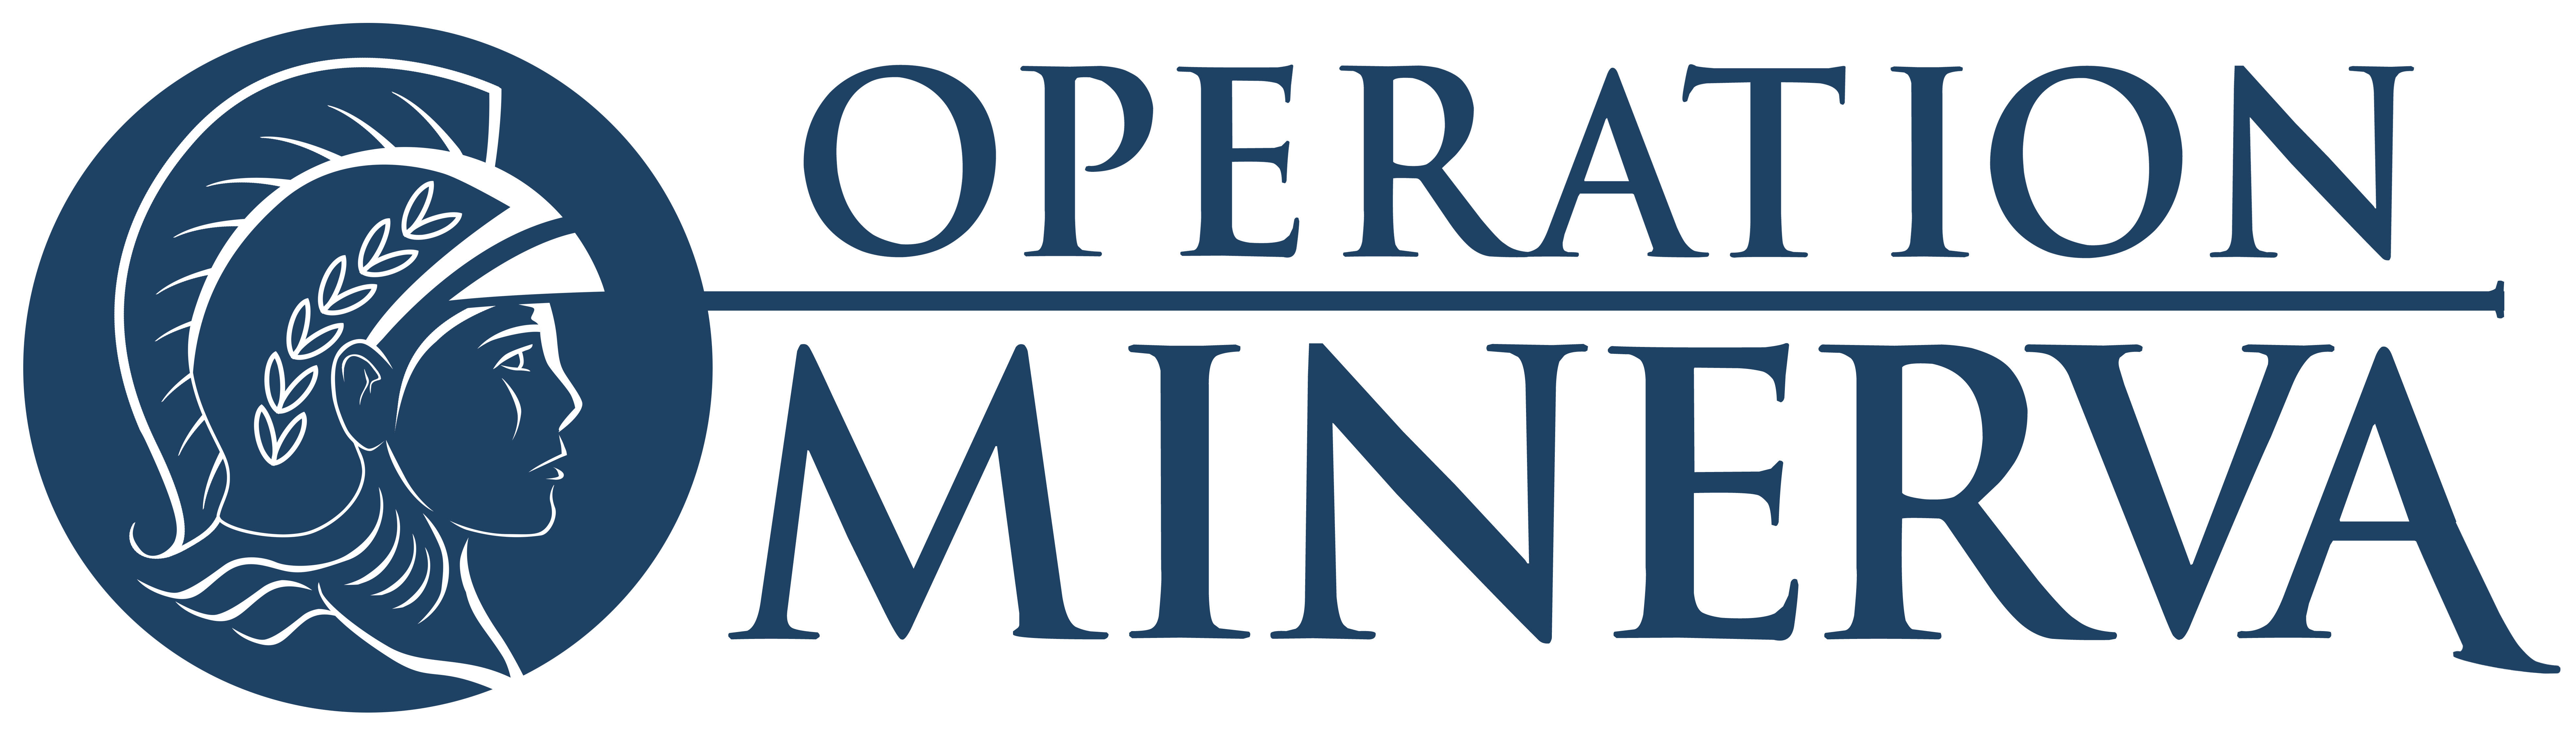 Operation Minerva Logo.jpeg